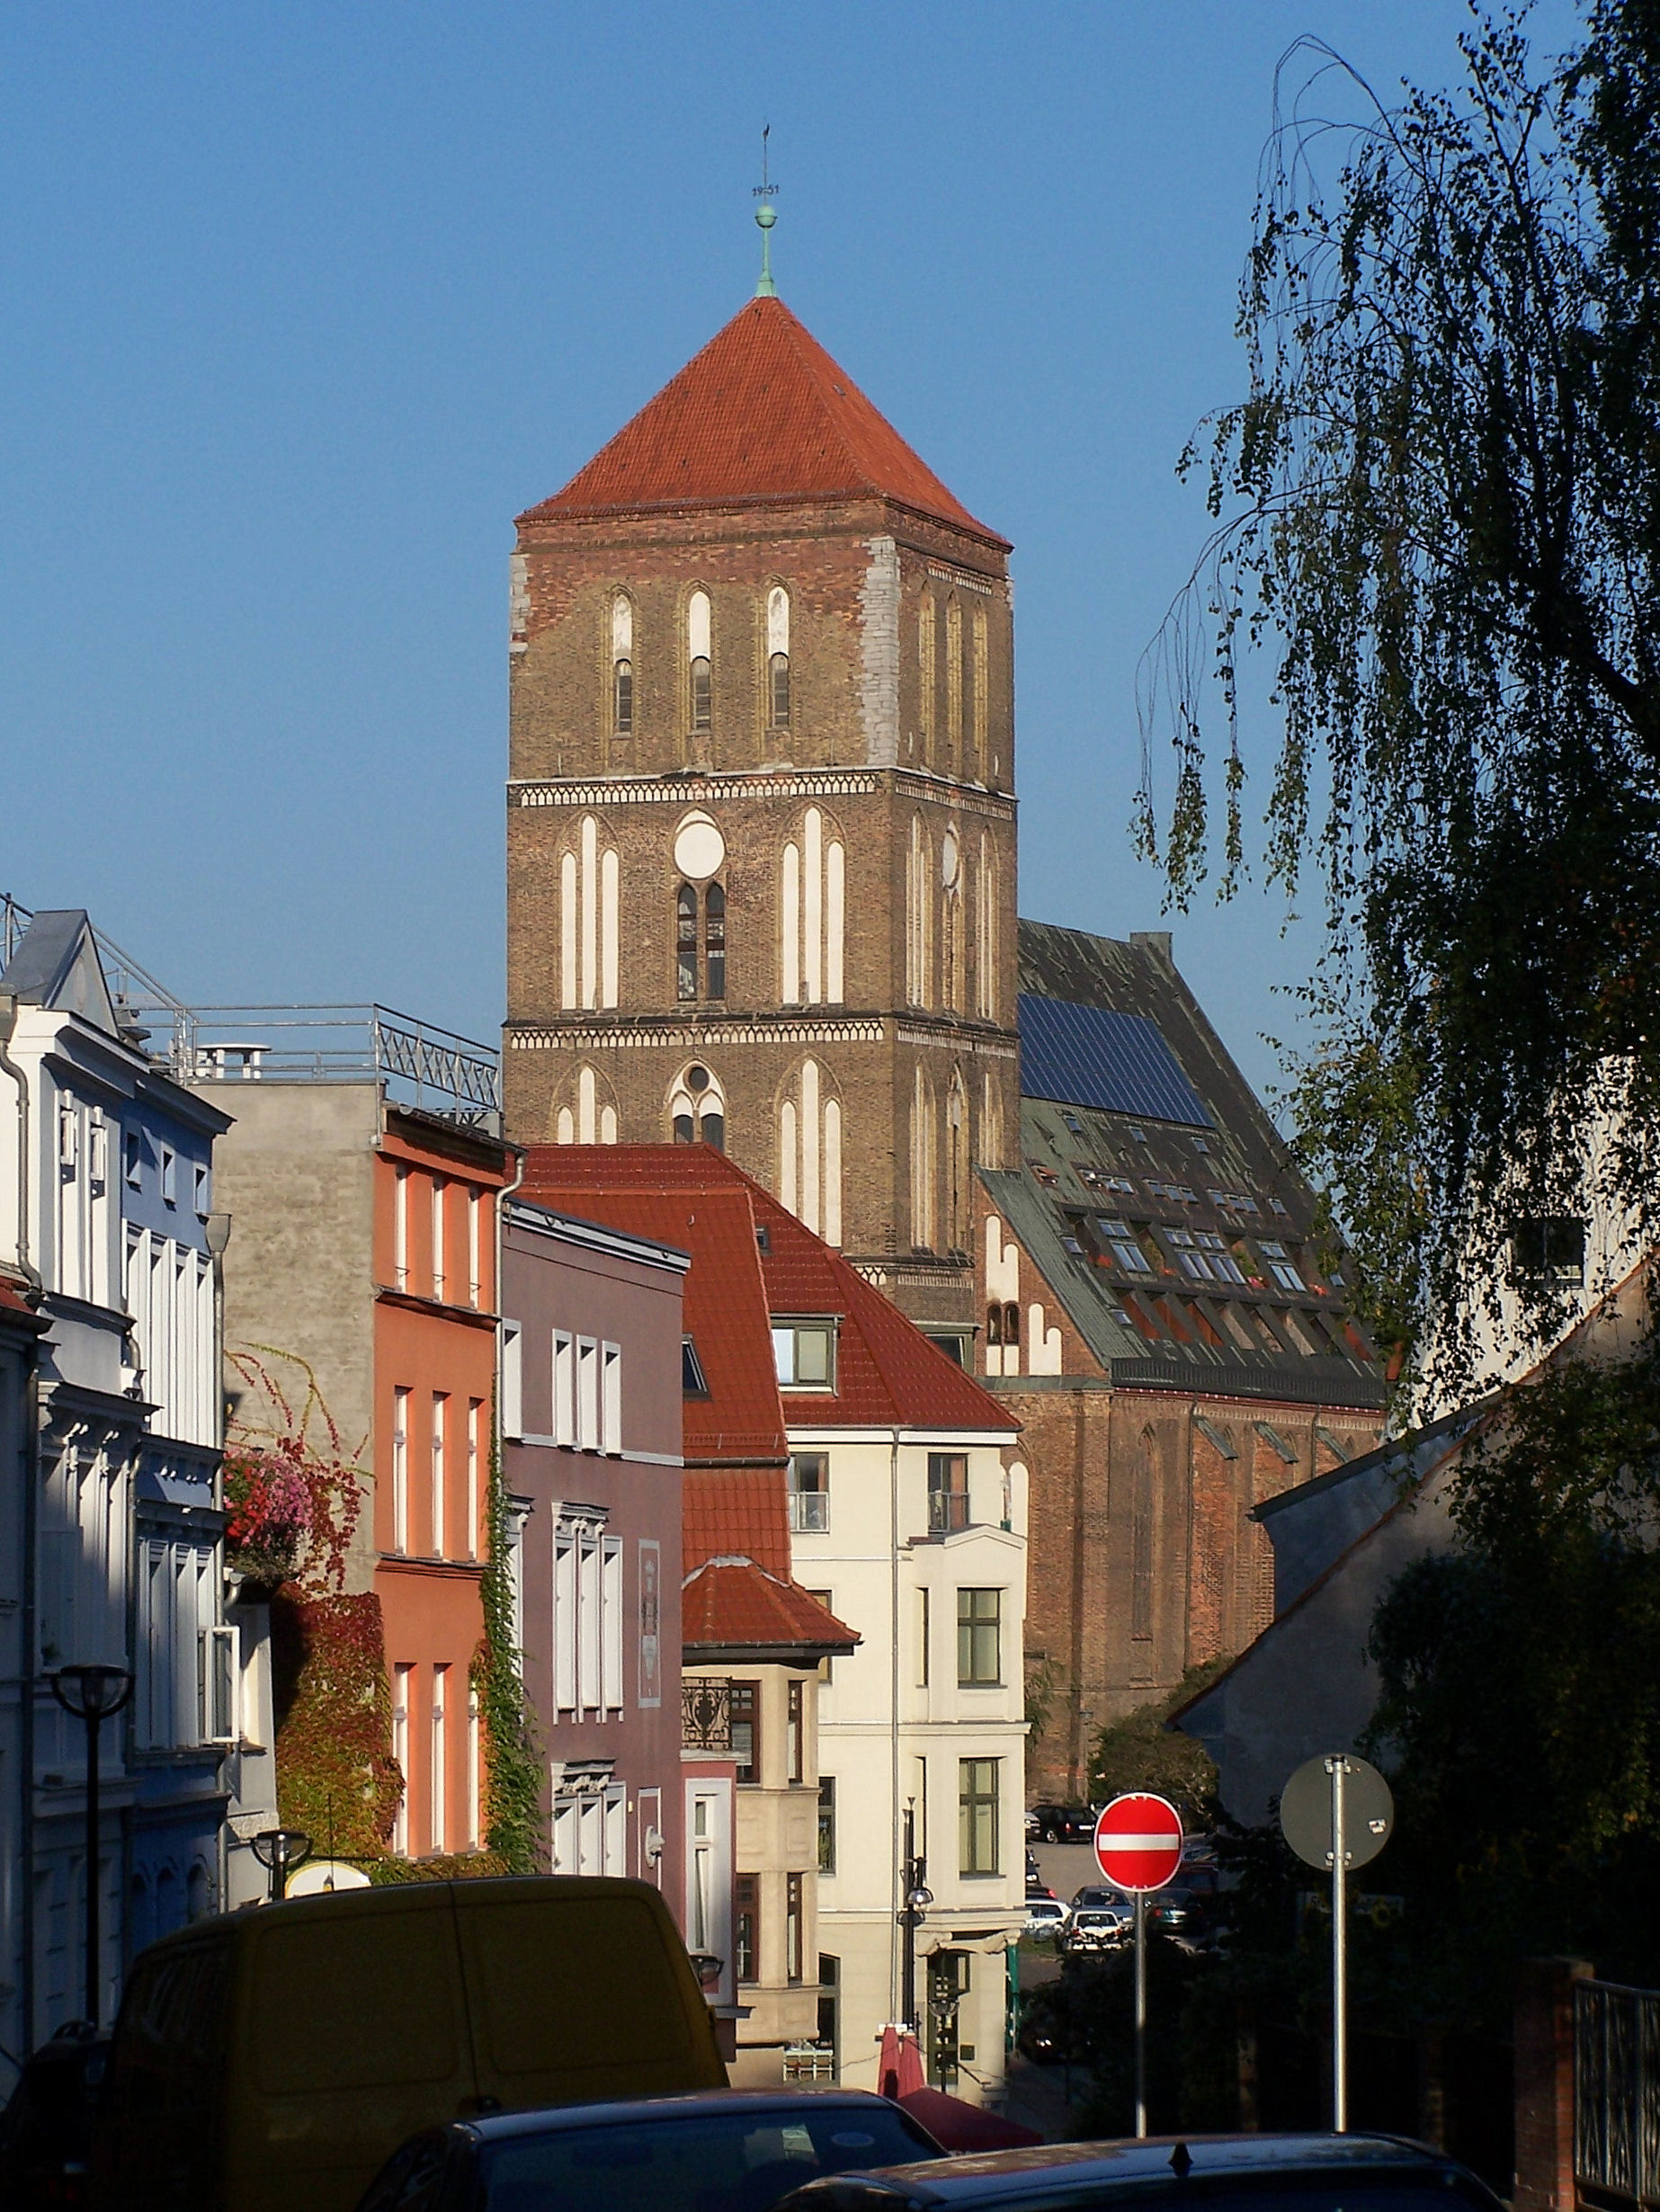 frauenchat Rostock